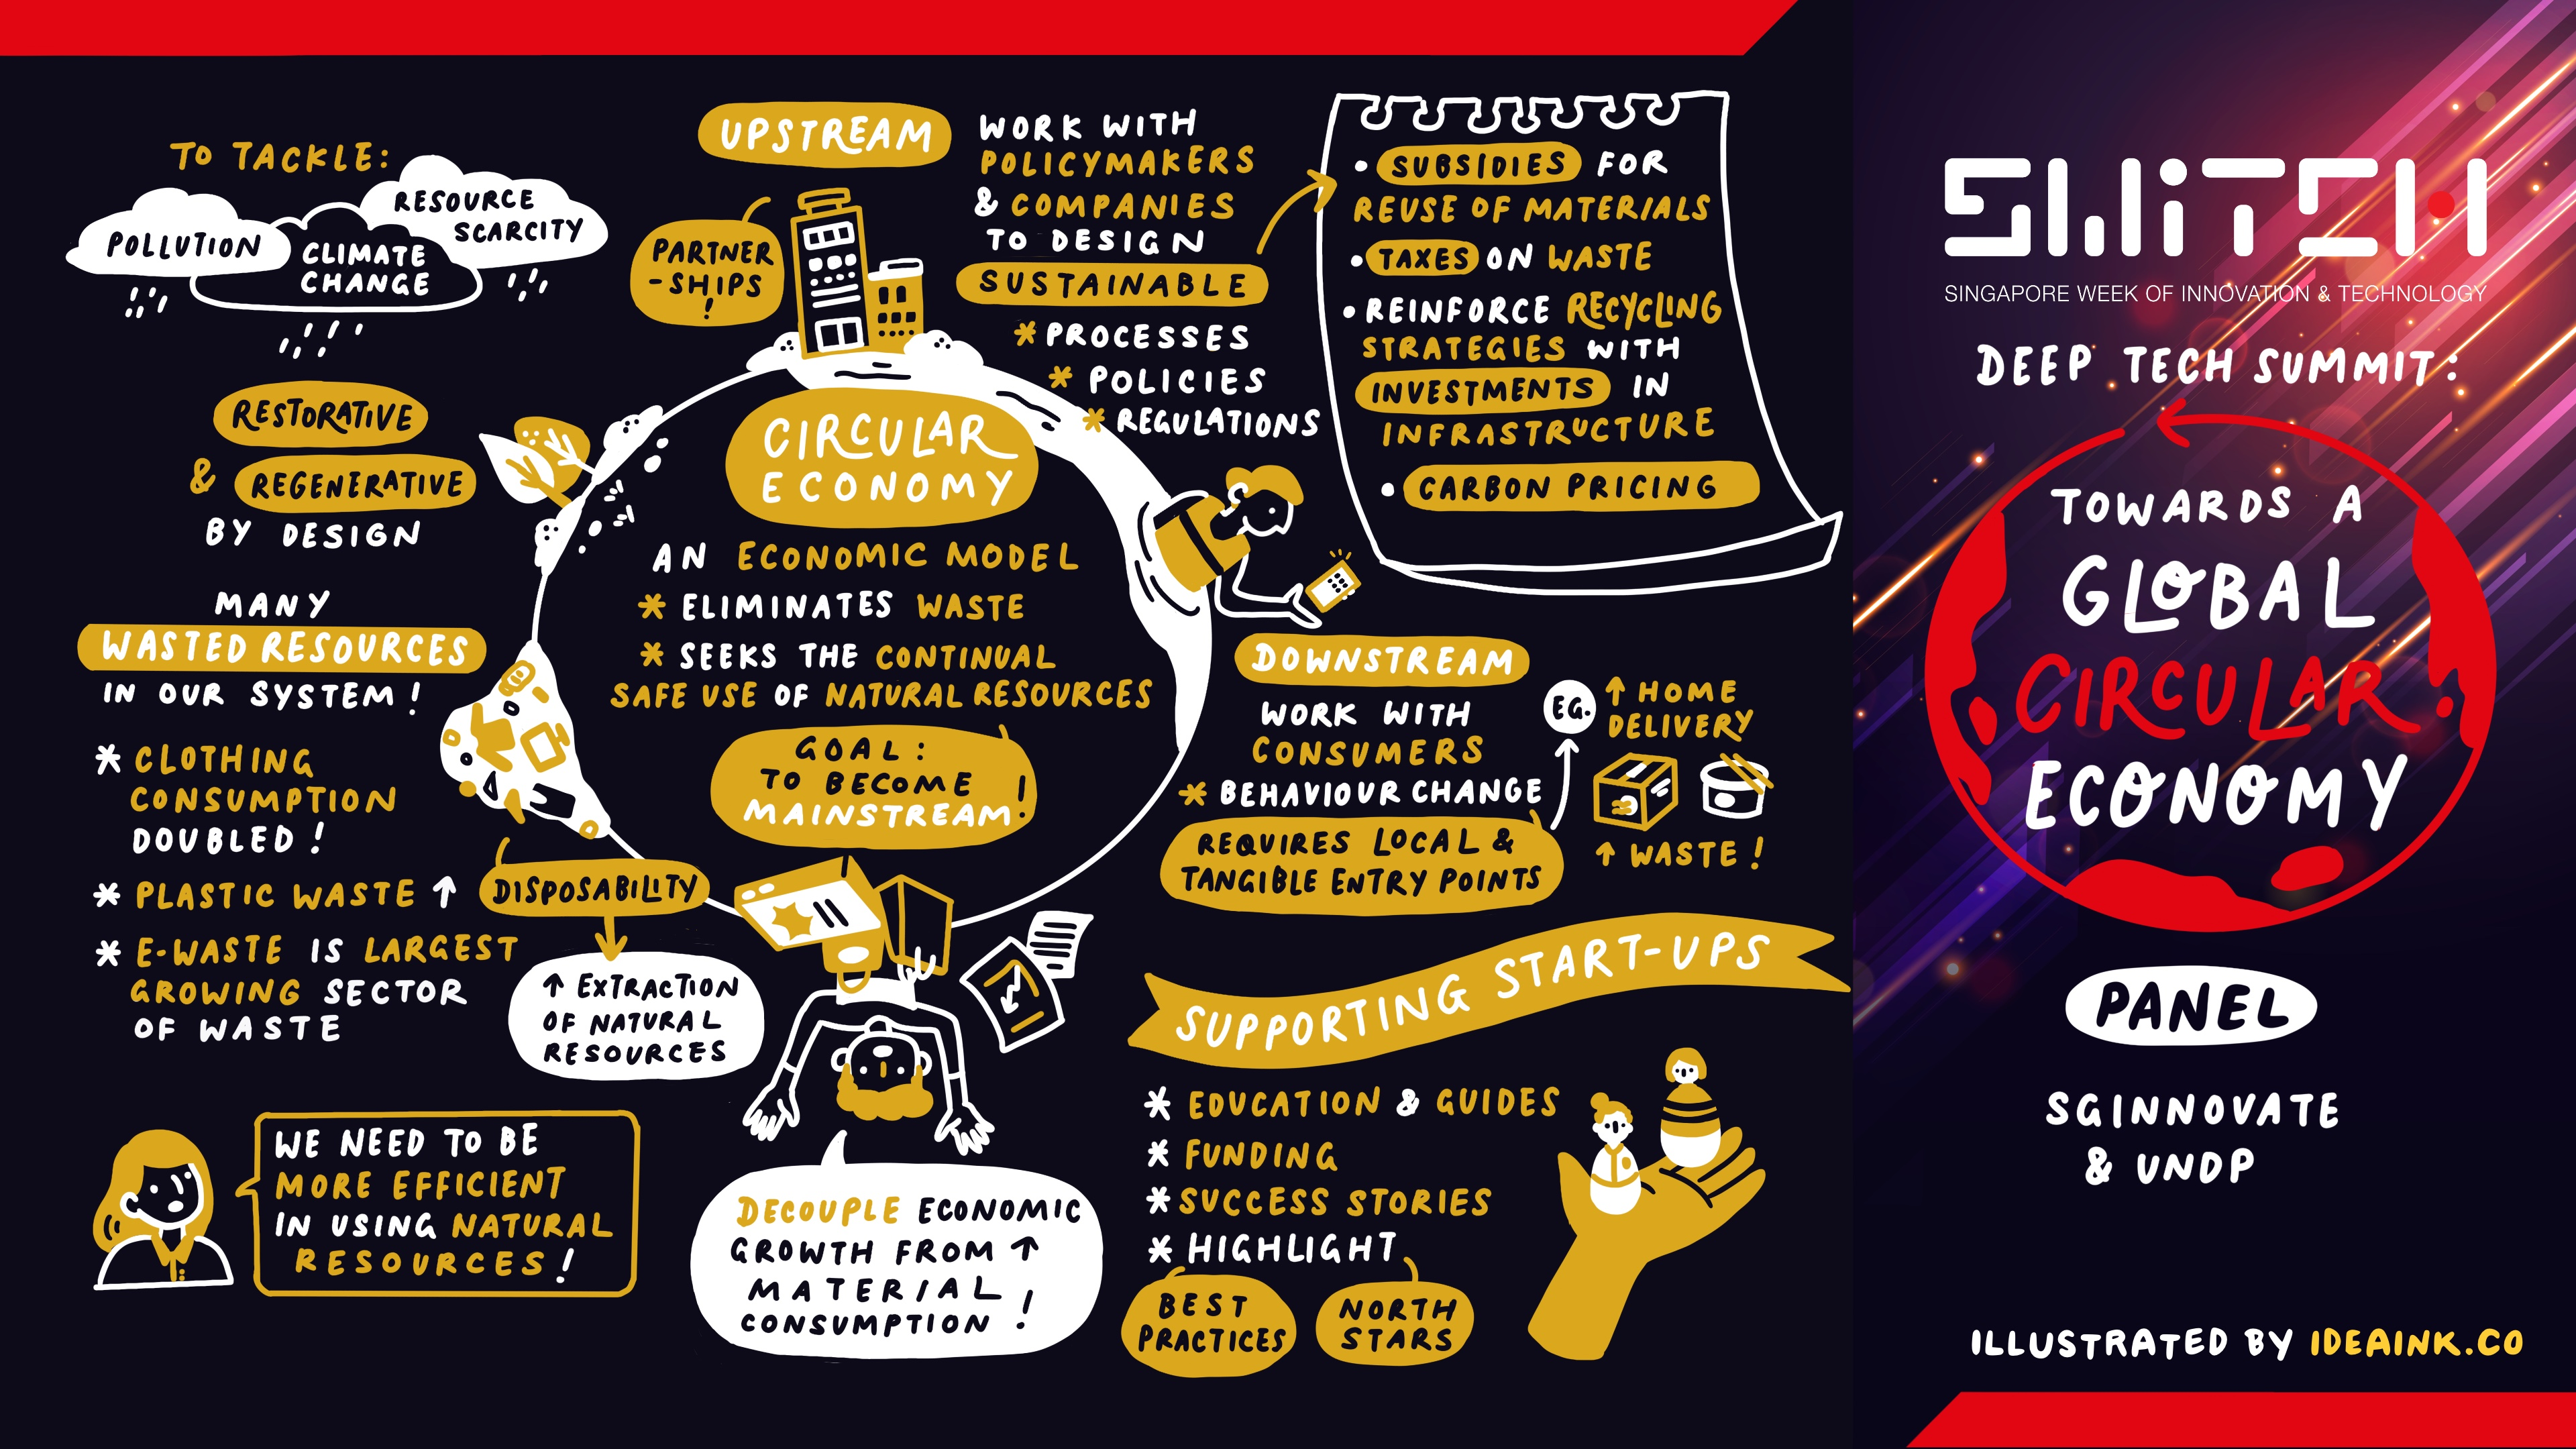 Deep Tech Summit: Towards a Global Circular Economy